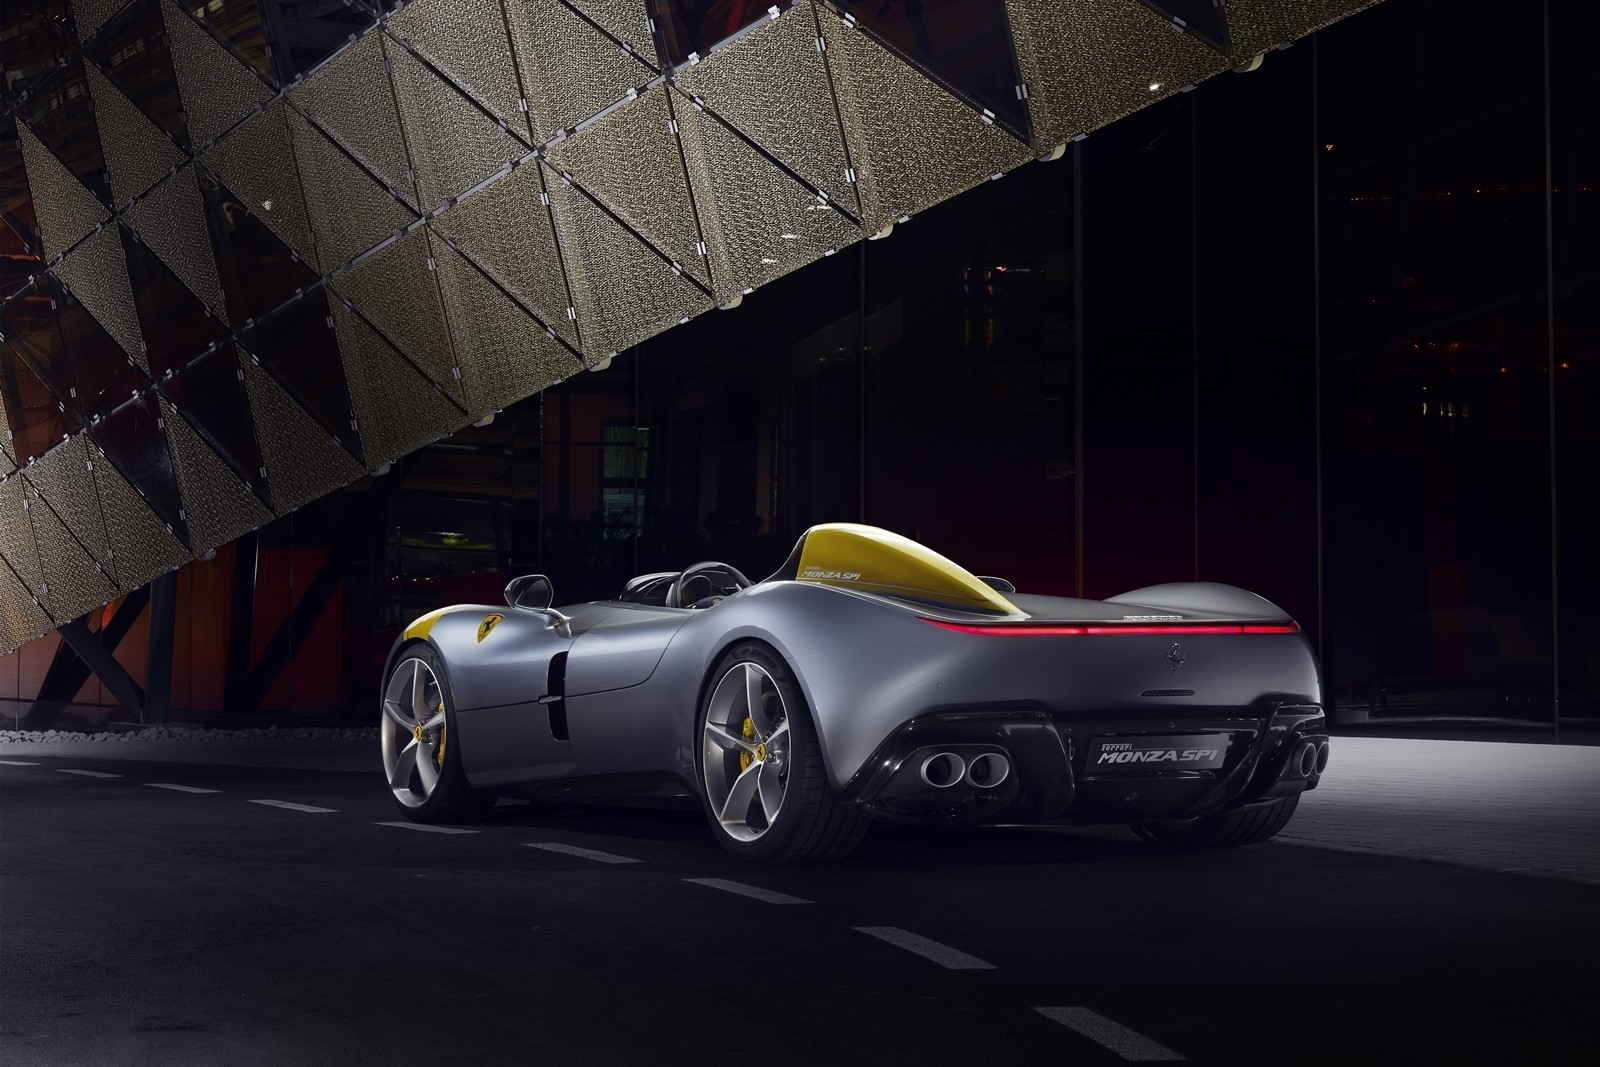 Foto de Ferrari Monza SP1 y Monza SP2 2019 (1/14)